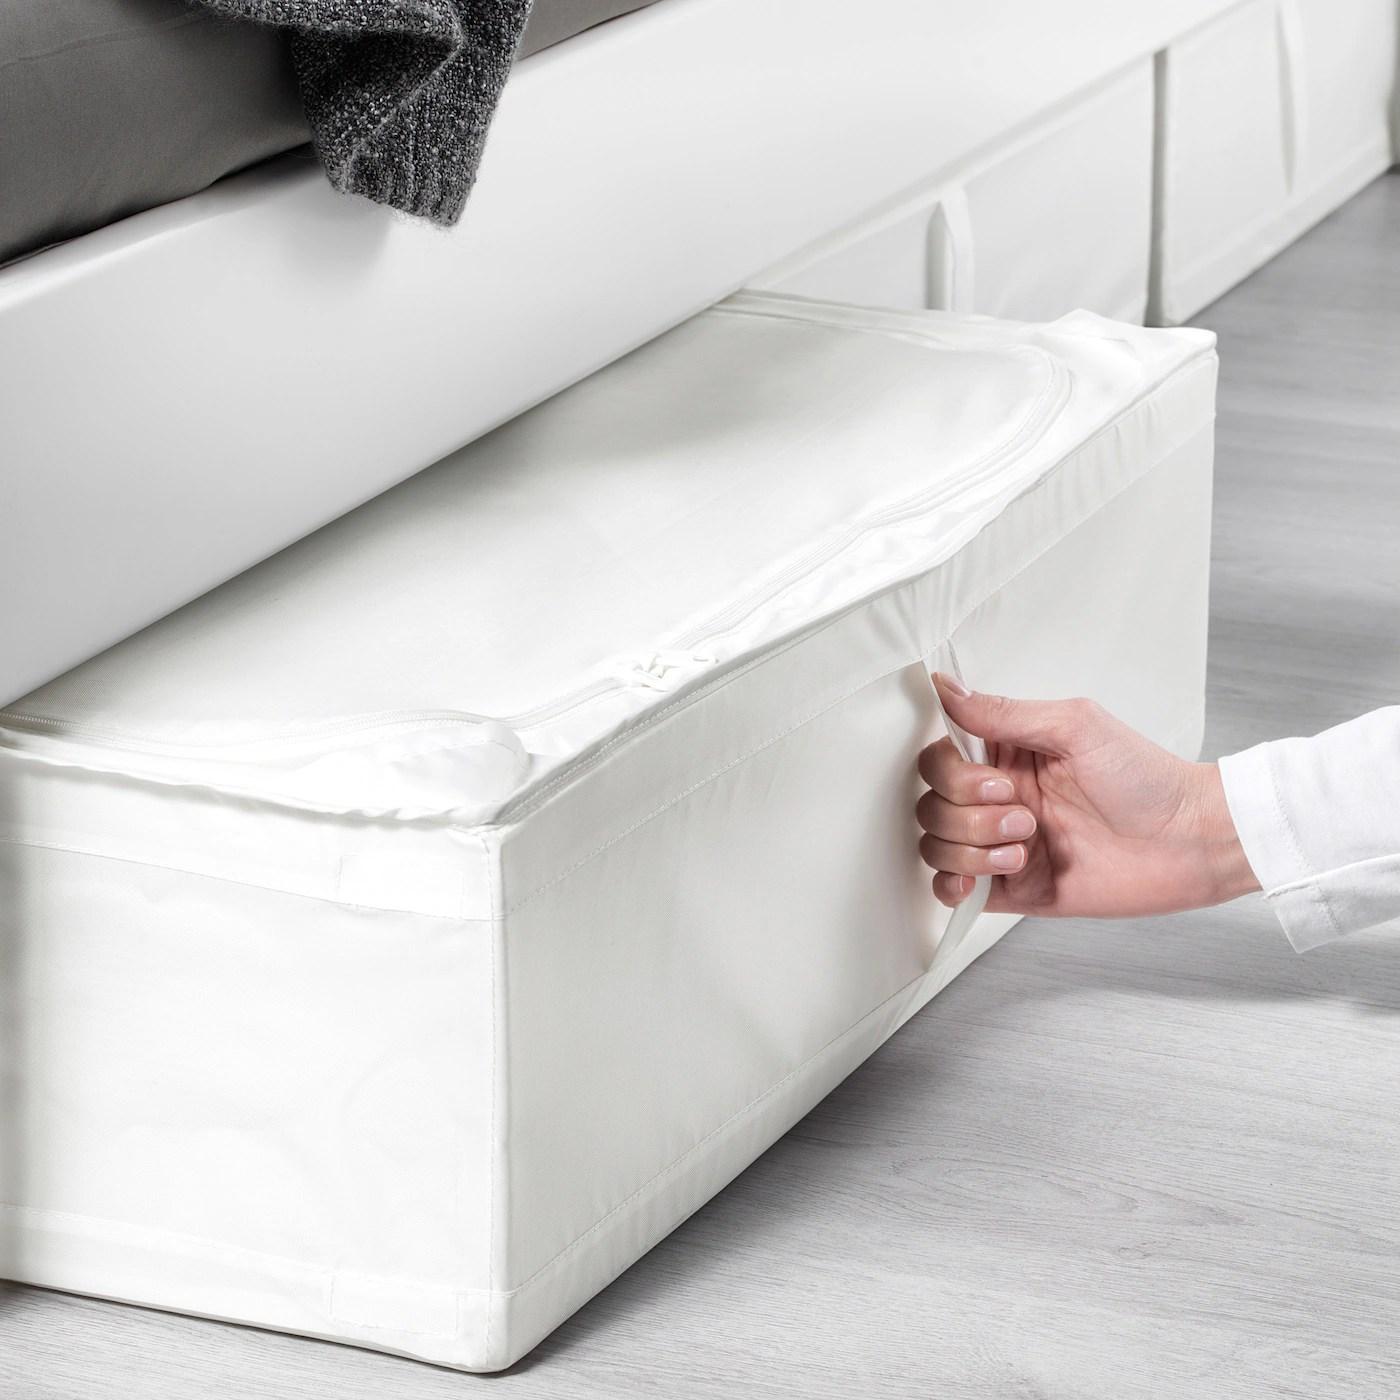 Skubb Sac De Rangement Blanc 69x55x19 Cm Ikea Suisse